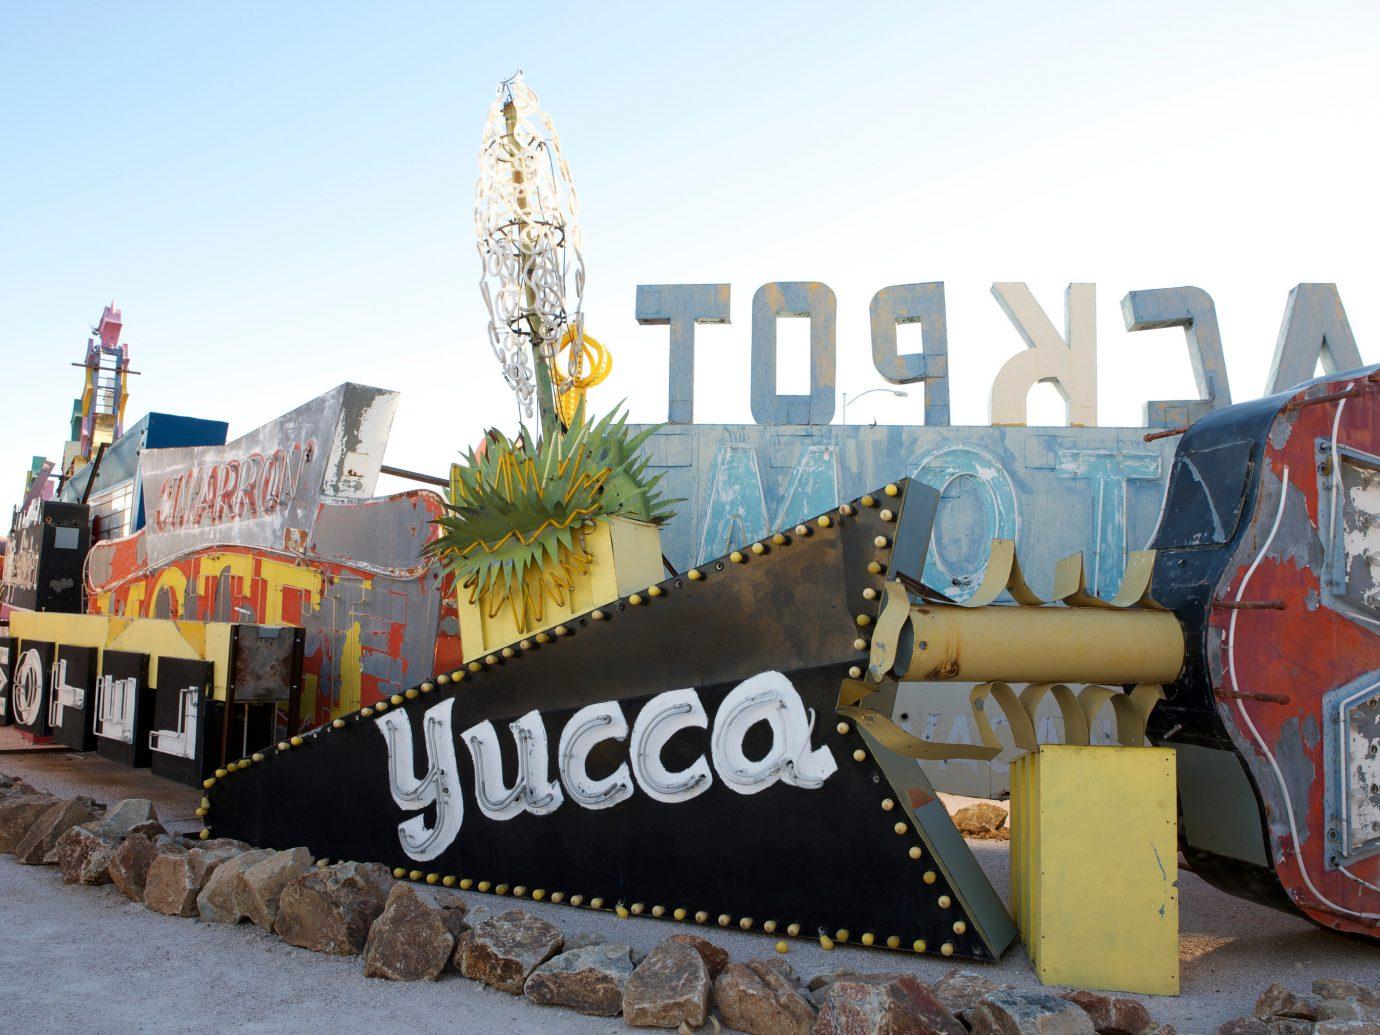 Girls Getaways Trip Ideas Weekend Getaways sky City amusement park Playground park Resort bedclothes